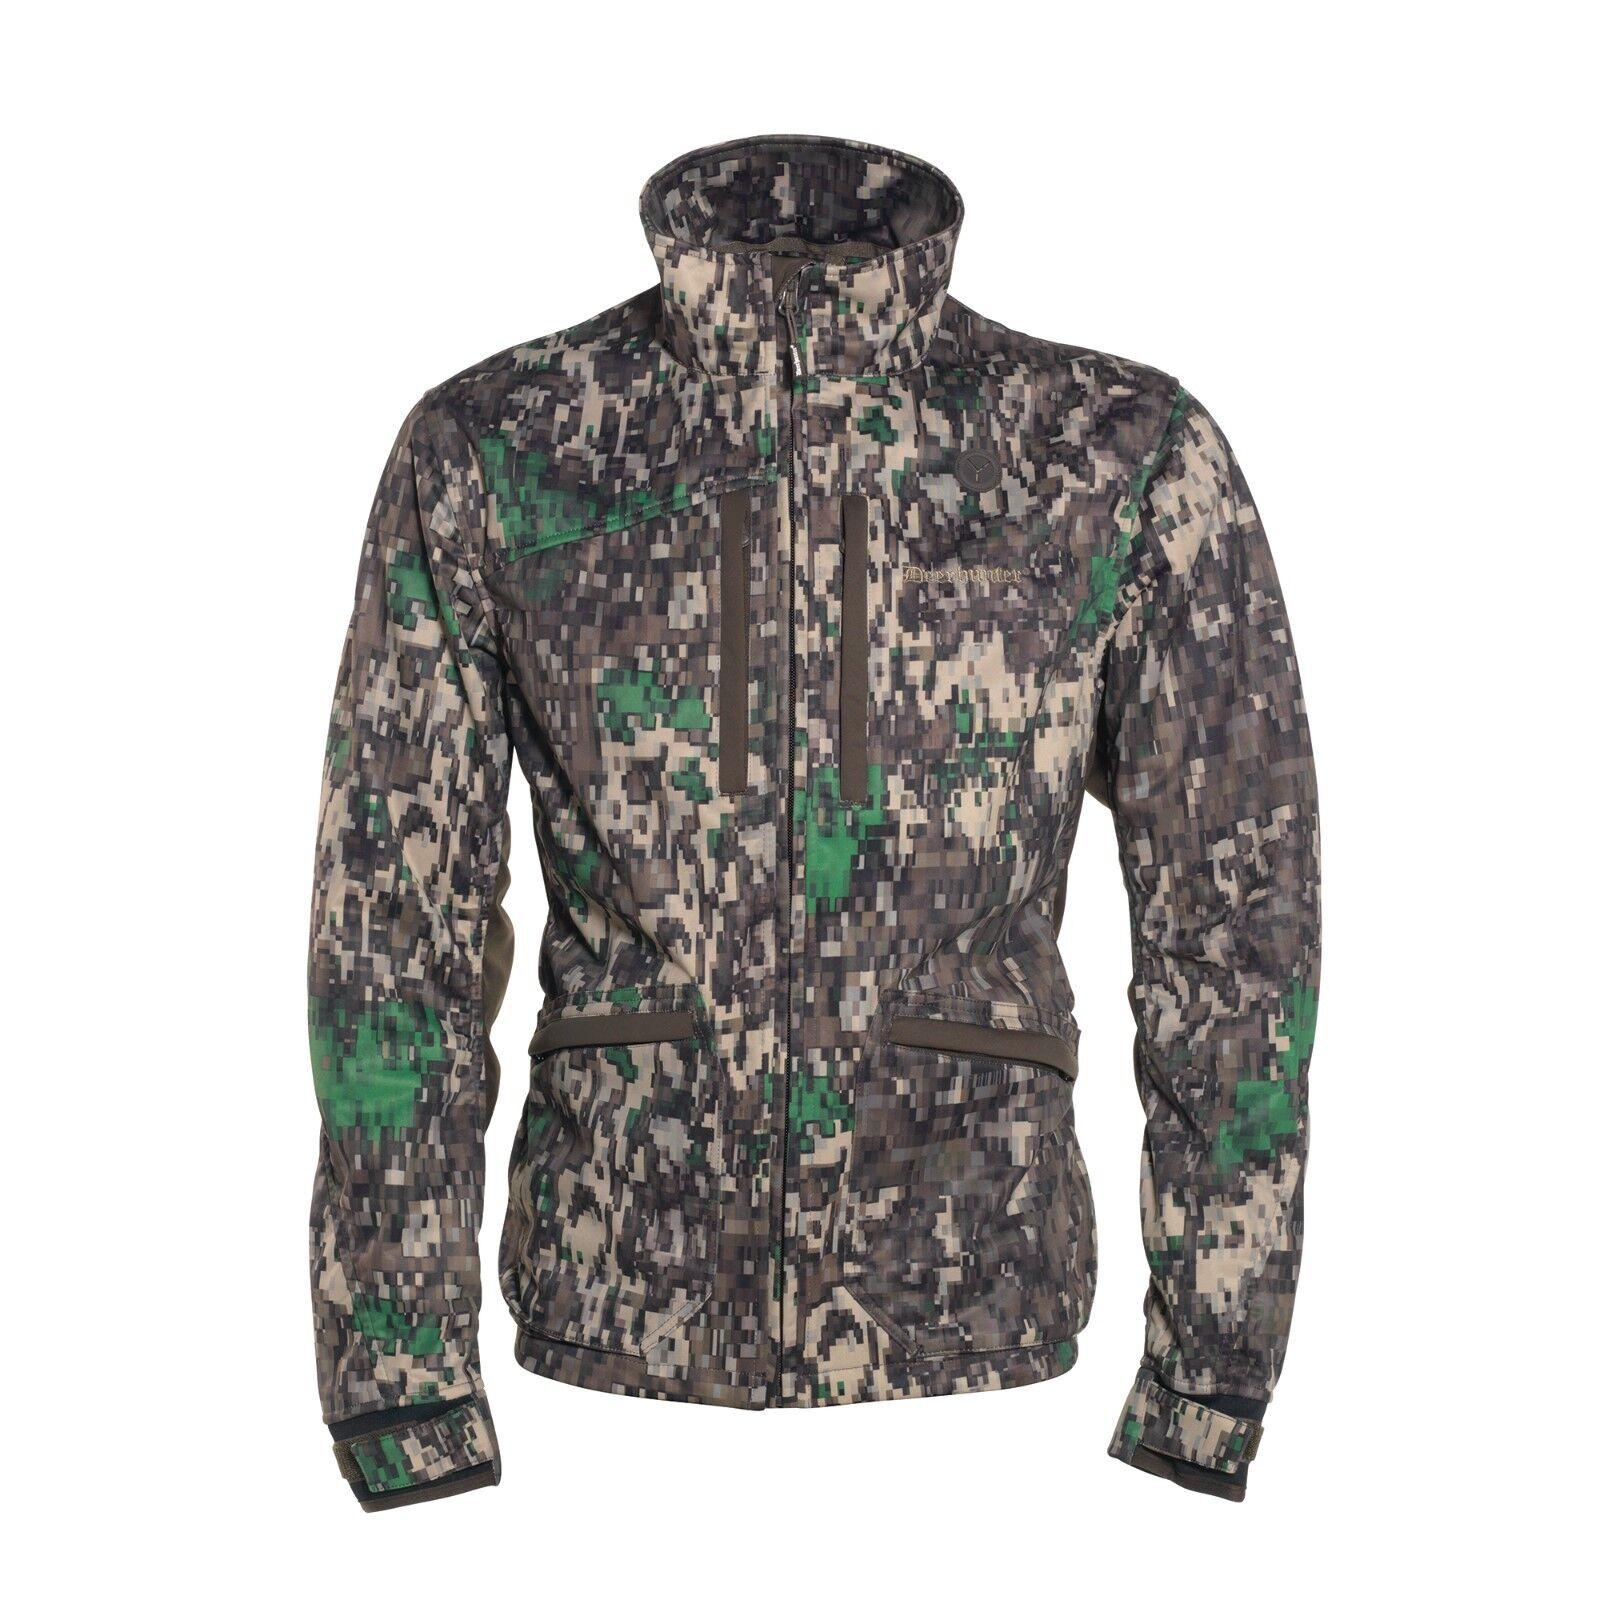 Deerhunter Pnetwerkator Hunting Jasje w. Teflon Camo Hunting Shooting RRP -65533;-655533;149.99